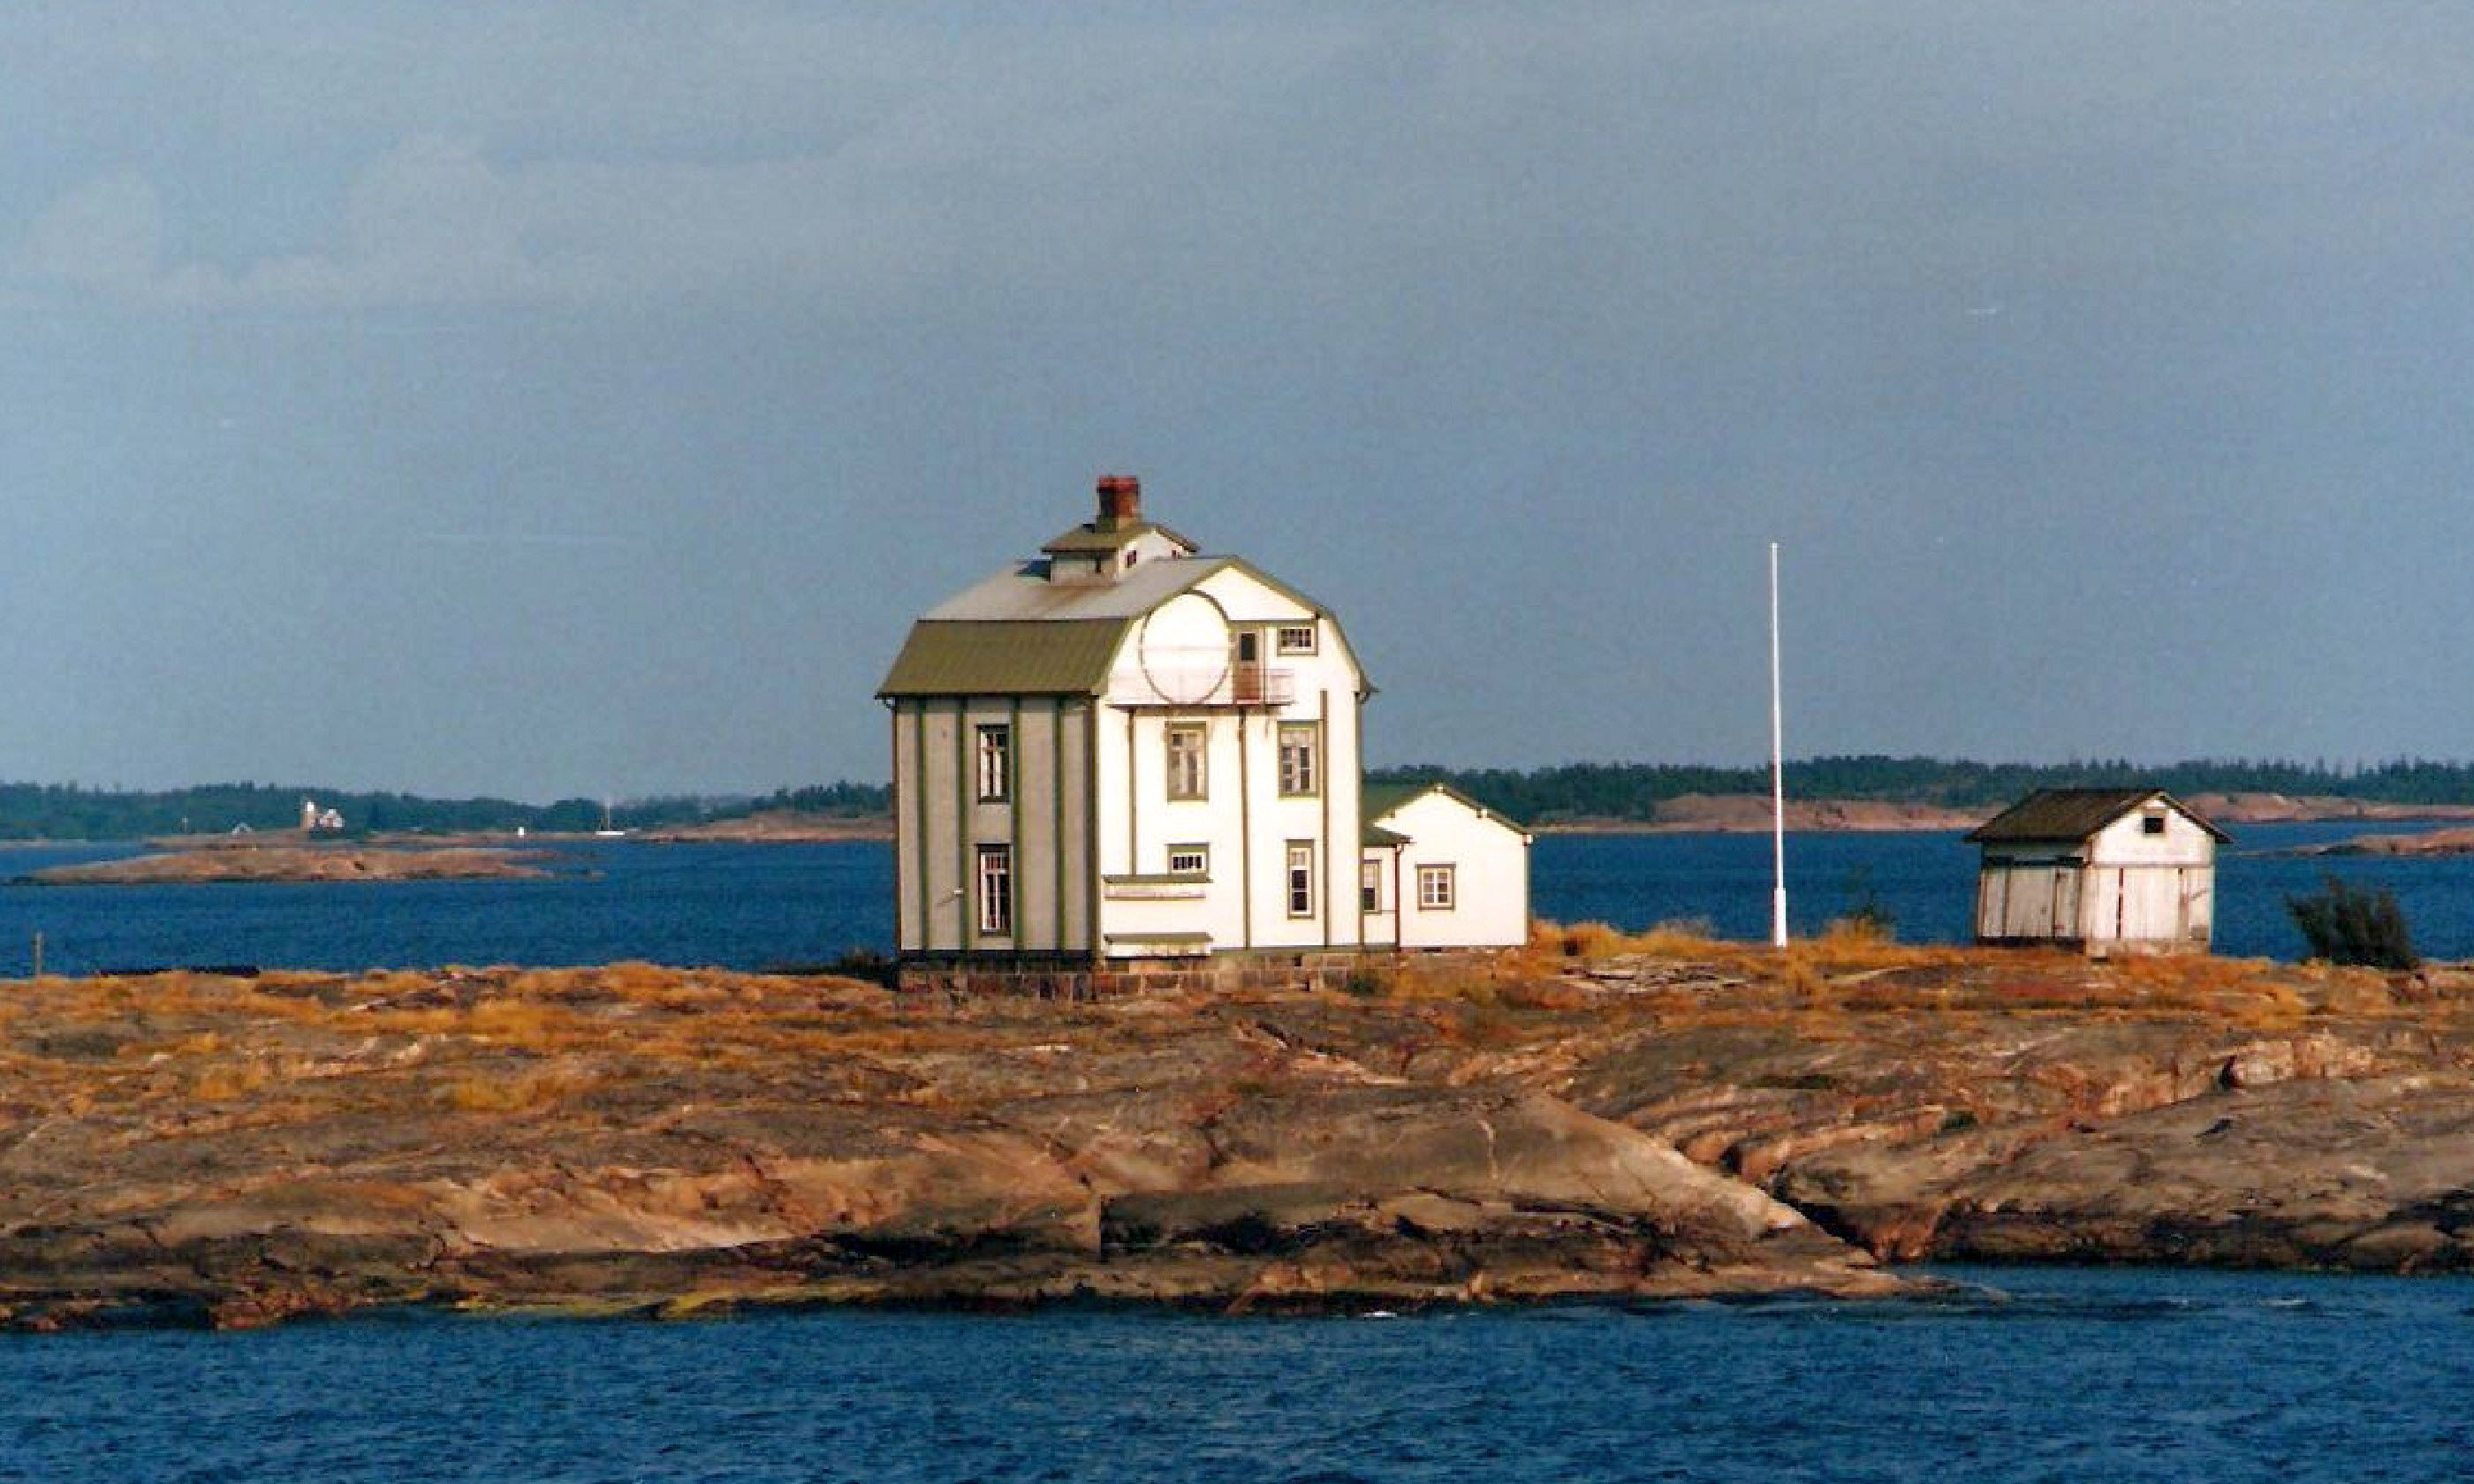 Åland (Flickr Creative Commons: Leo-setä)